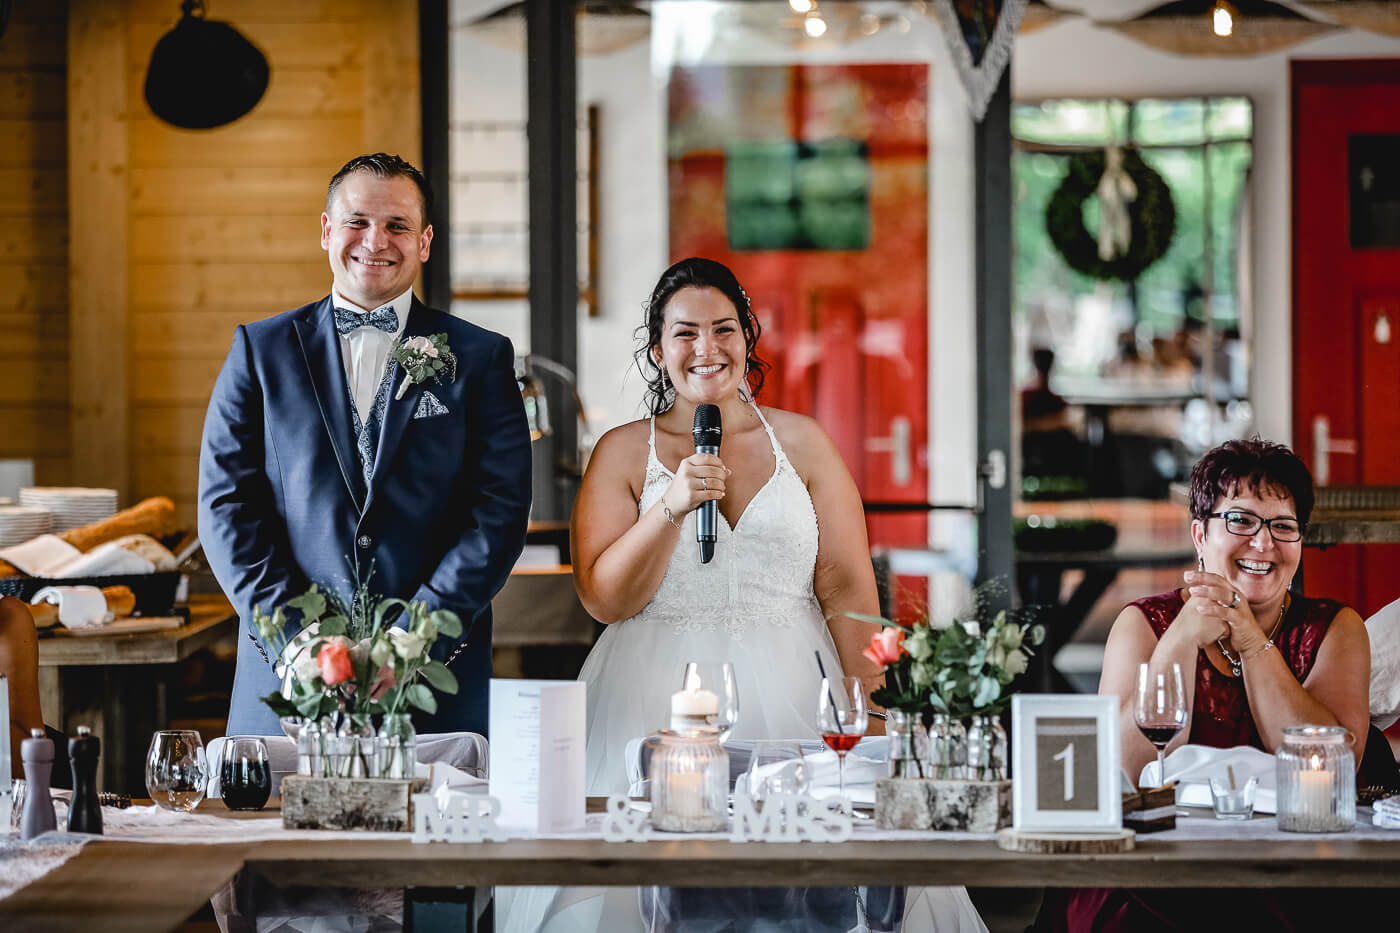 Kurze Hochzeitsrede